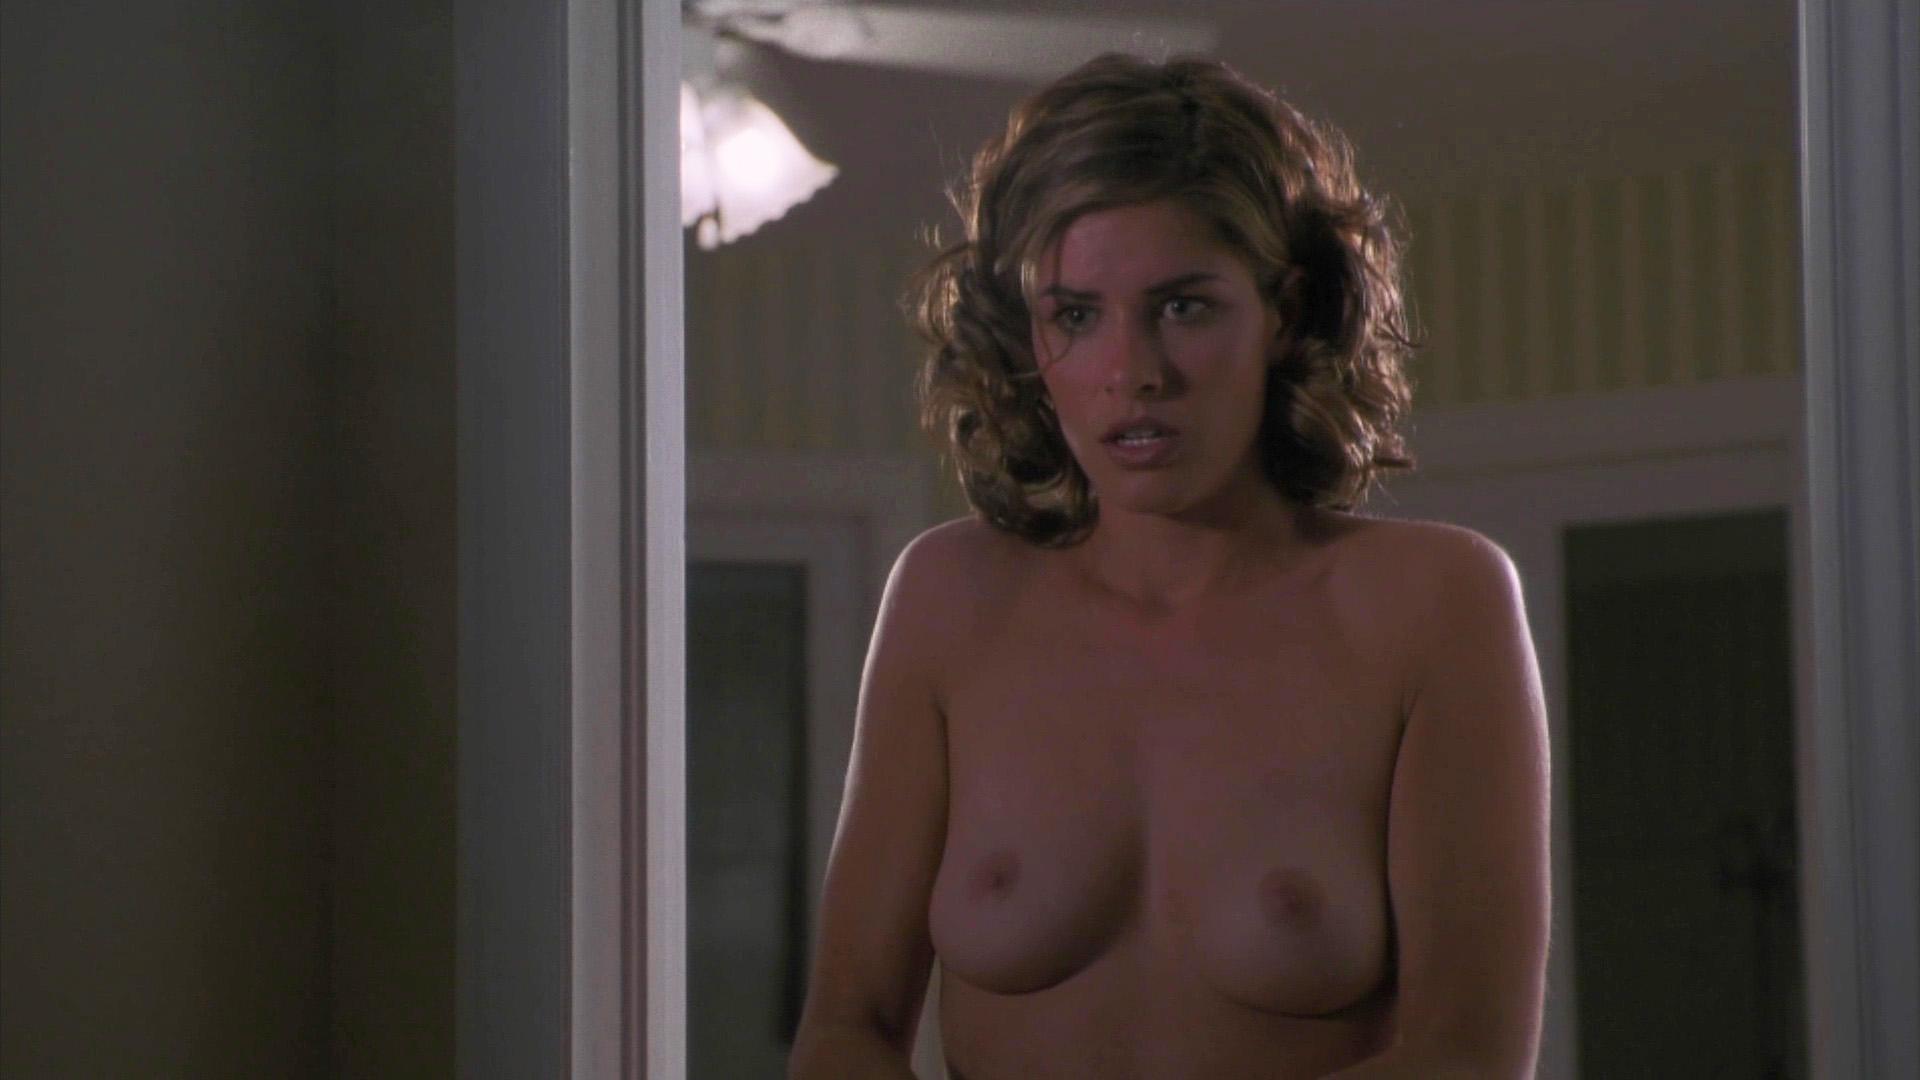 Amanda donohoe topless tumblr — 11